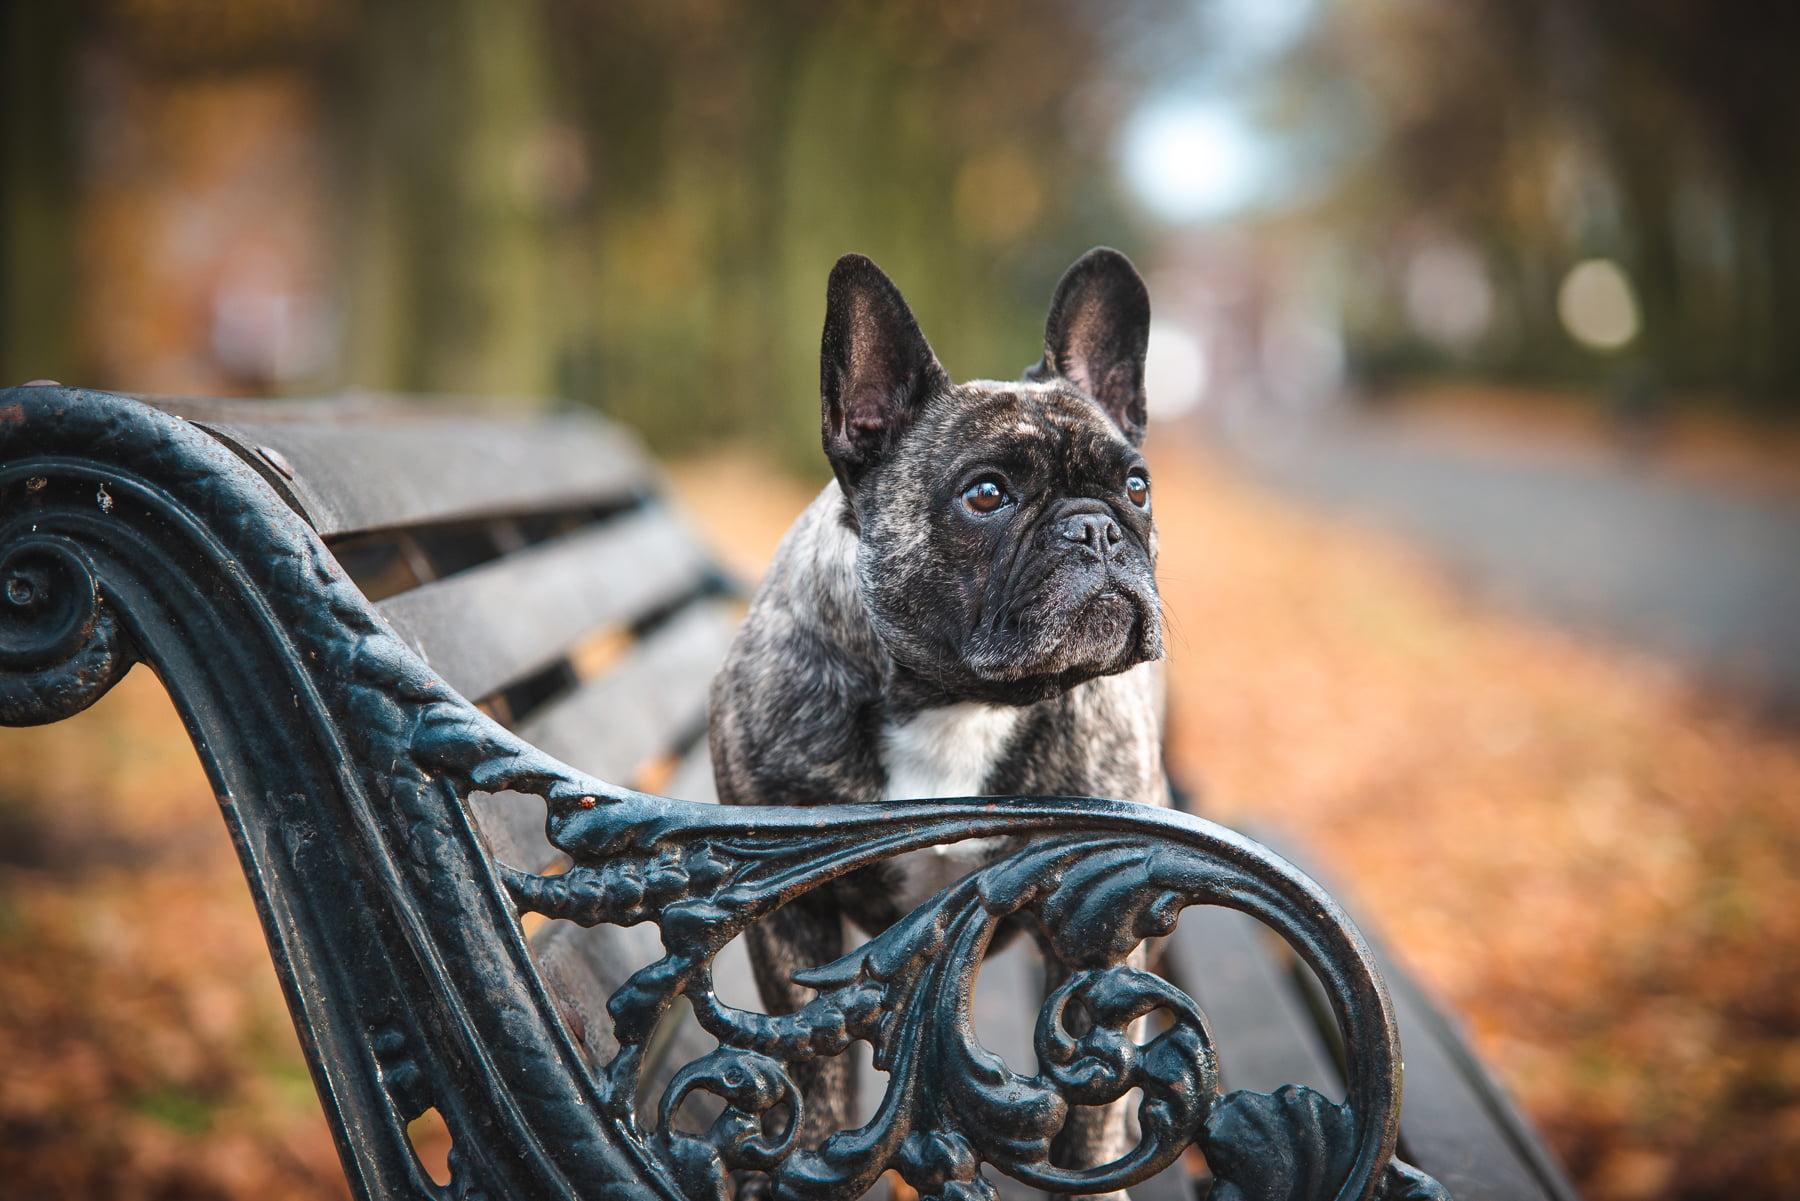 Autumn park bench dog photo - Copyright 2018 Diffuse Photo